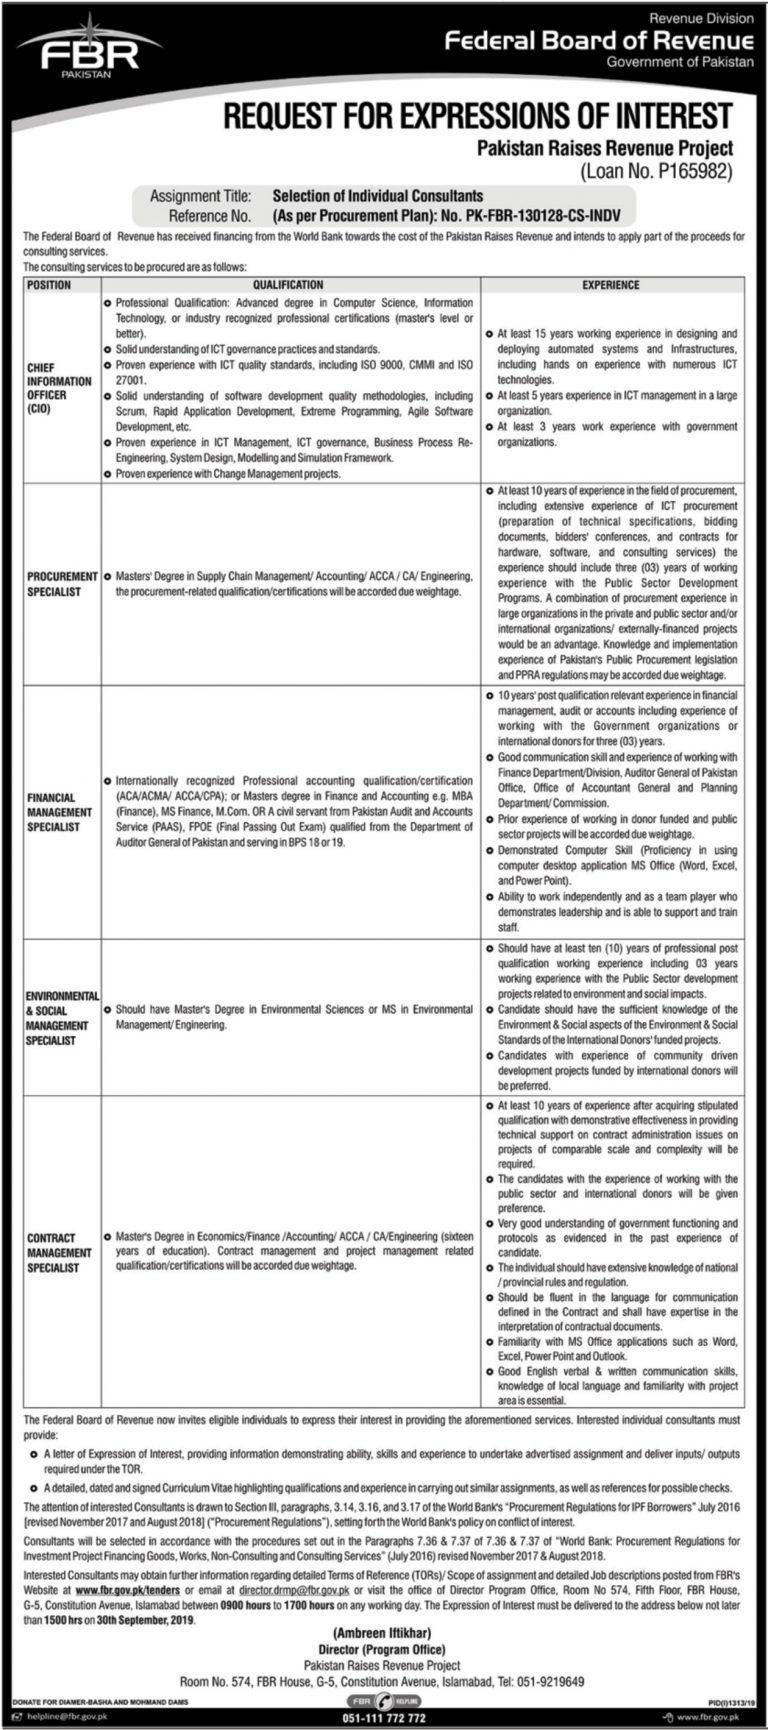 FBR Jobs Application Form 2019 Federal Board of Revenue Islamabad Latest